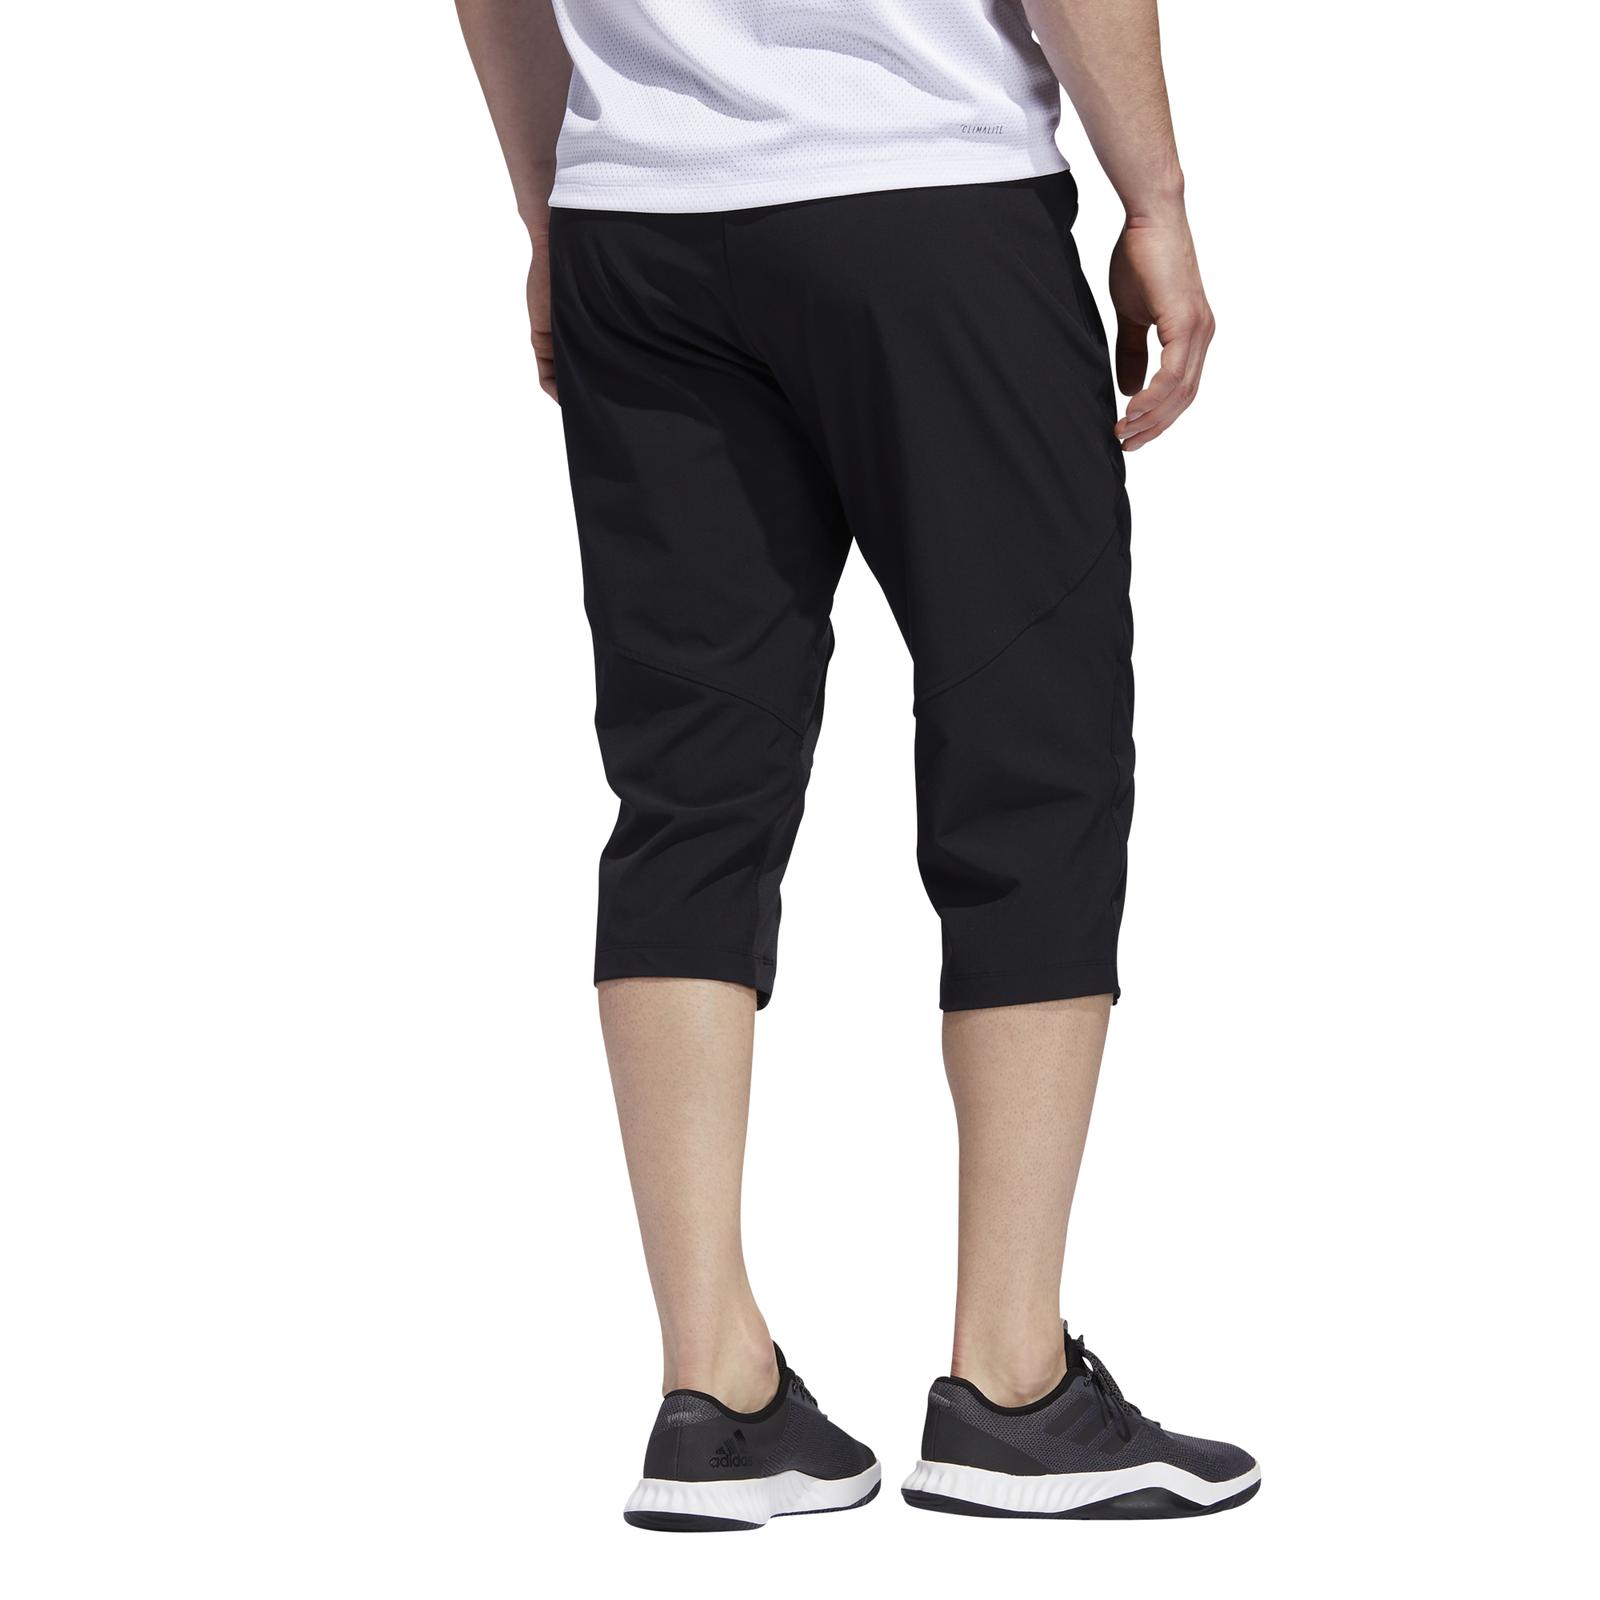 Performance 34 zu schwarz Herren Trainingshose Hose Climacool Details adidas 34 Workout iXZOkTPu